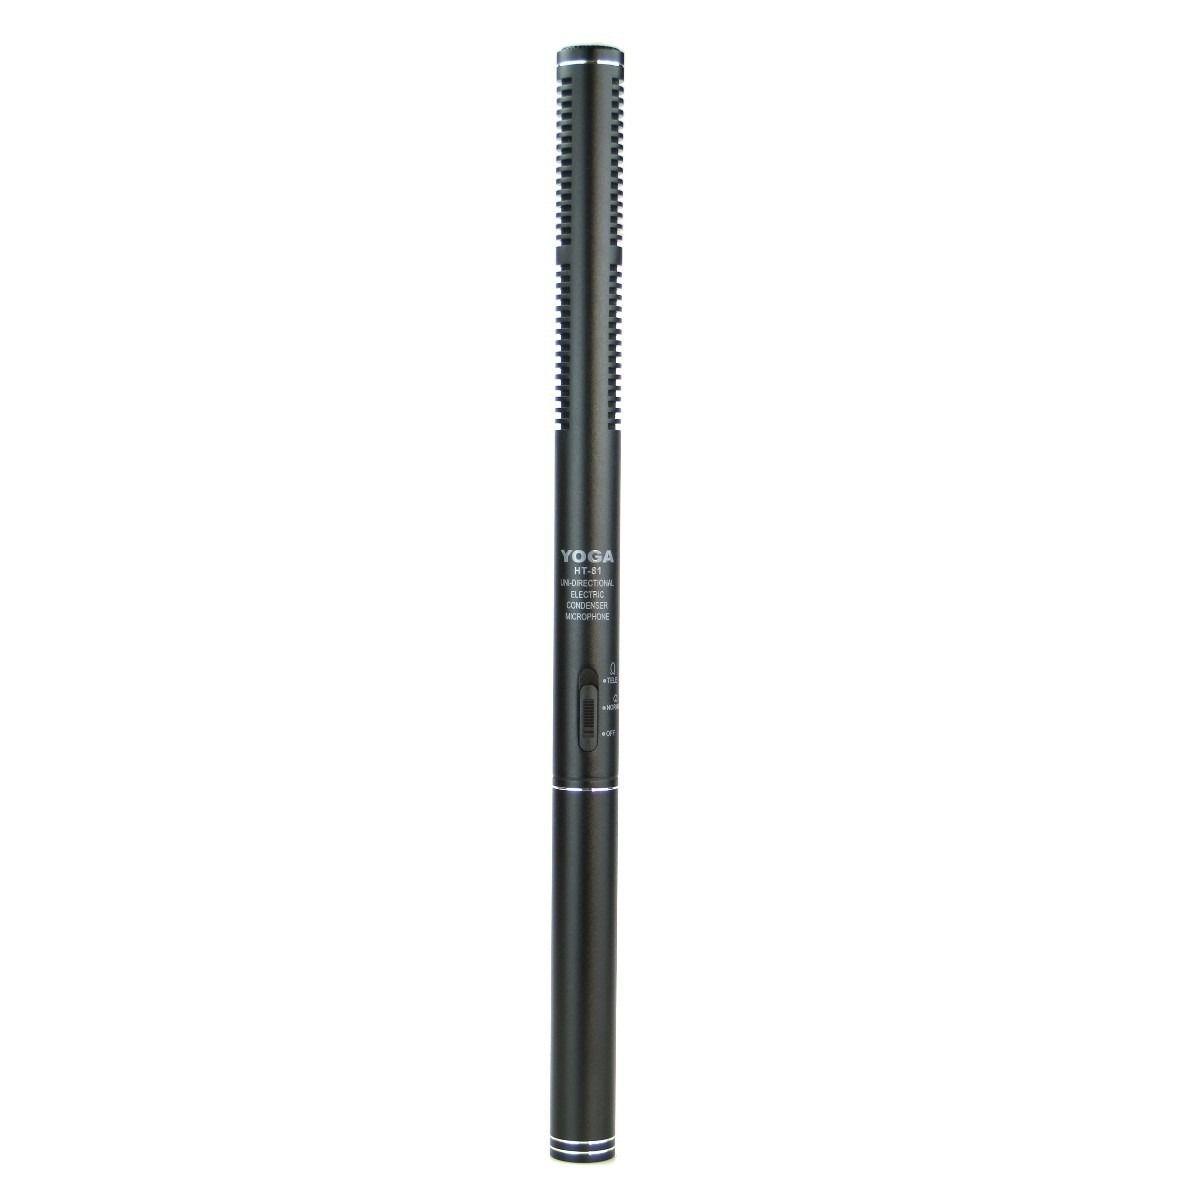 Kit 3 Microfone Shotgun CSR  Ht 81